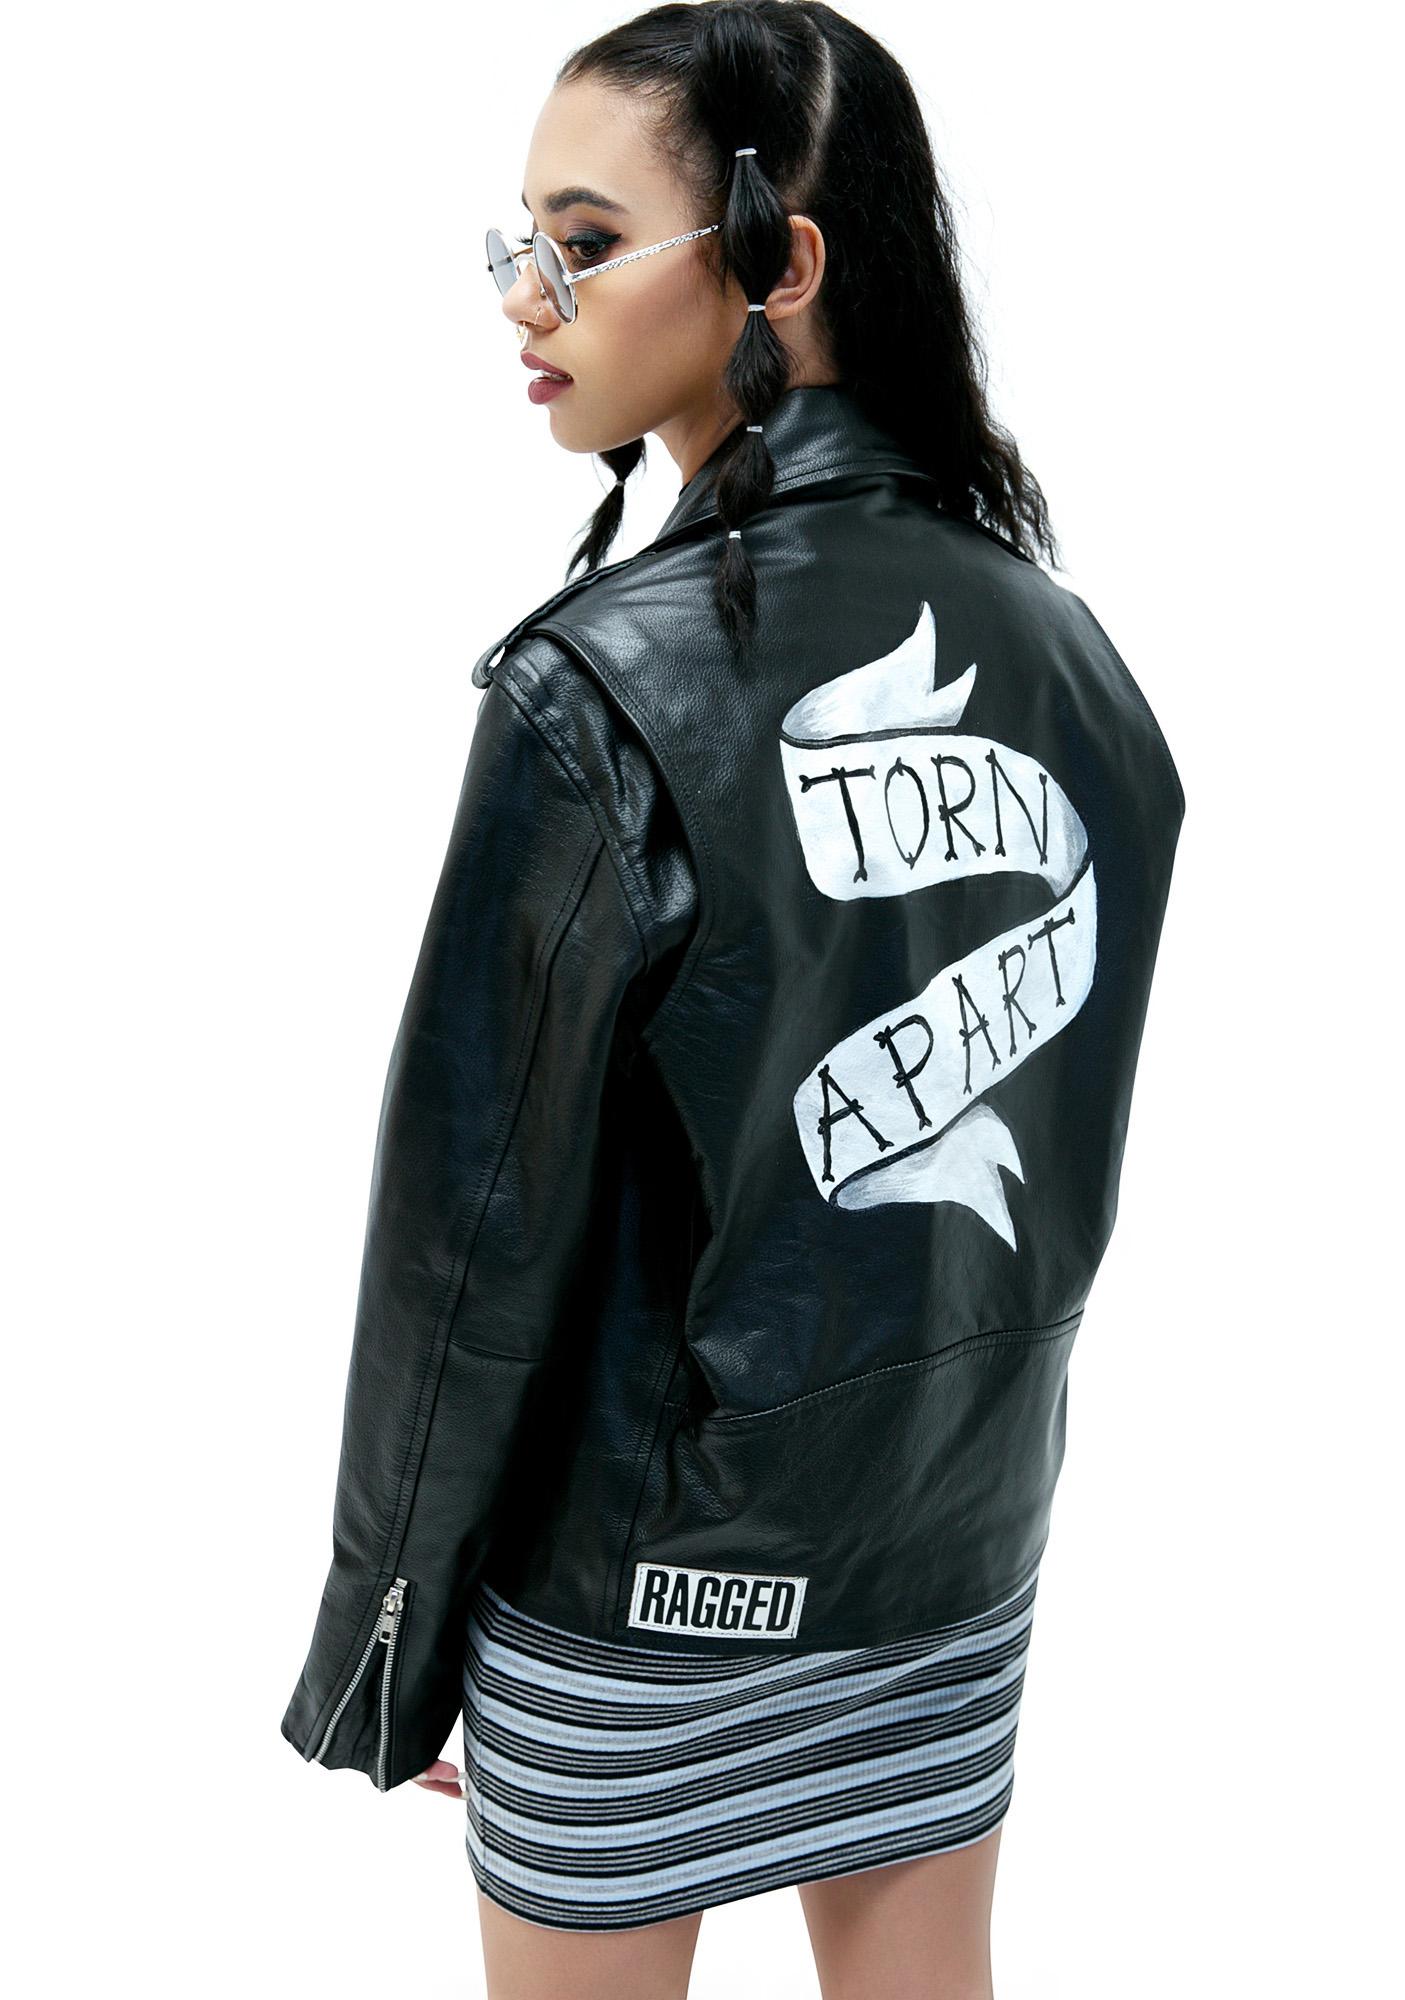 The Ragged Priest Shredder Biker Jacket